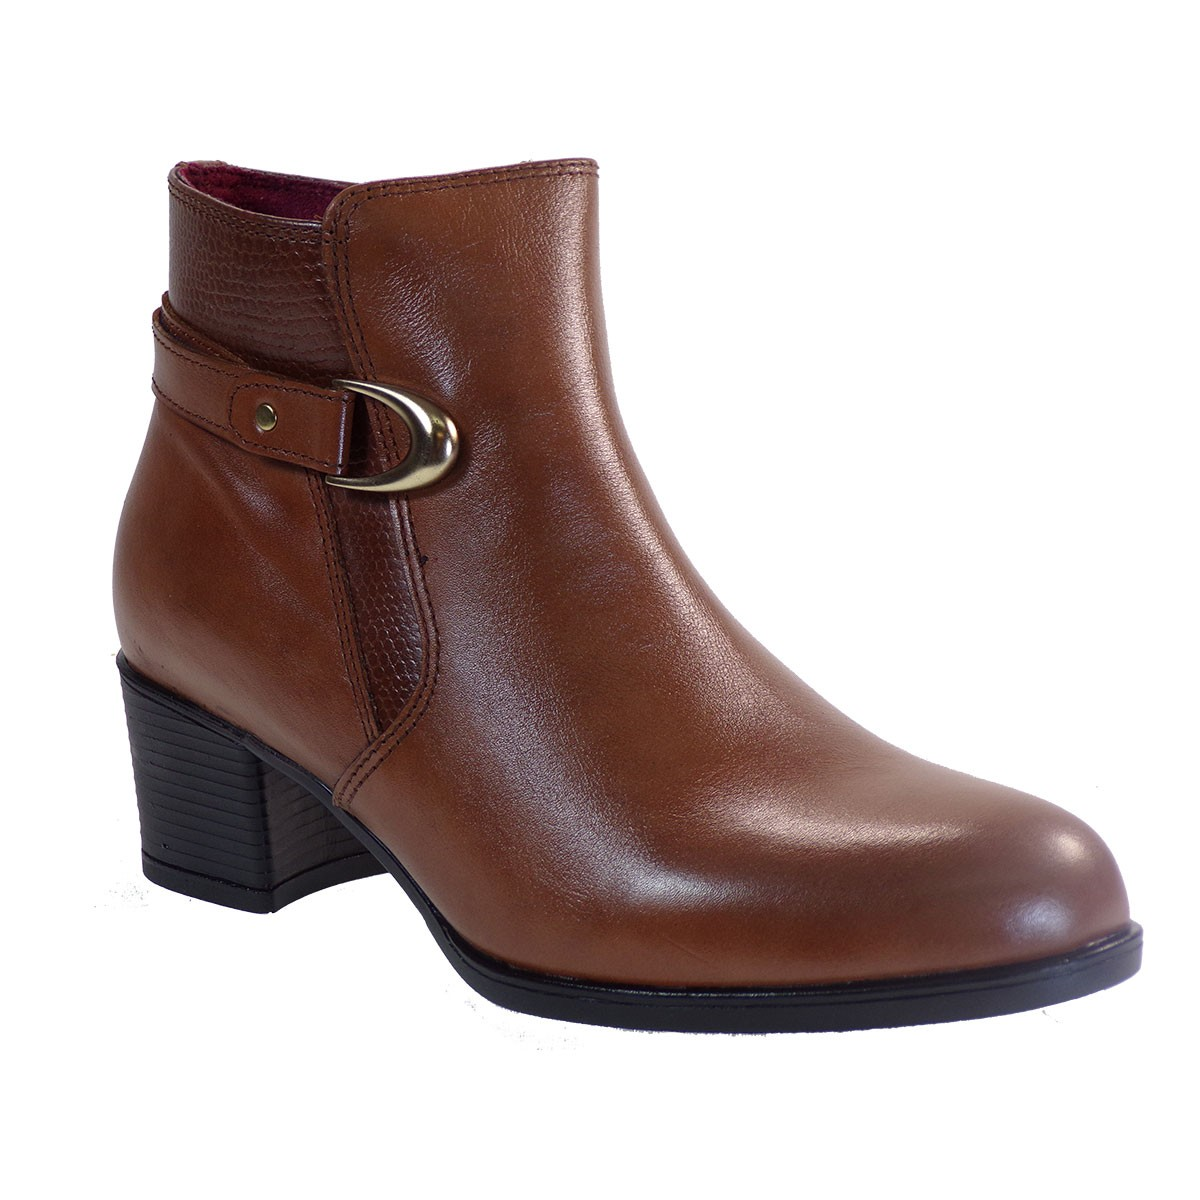 Softies Shoes Γυναικείες Μποτάκια 7231 Ταμπά Δέρμα